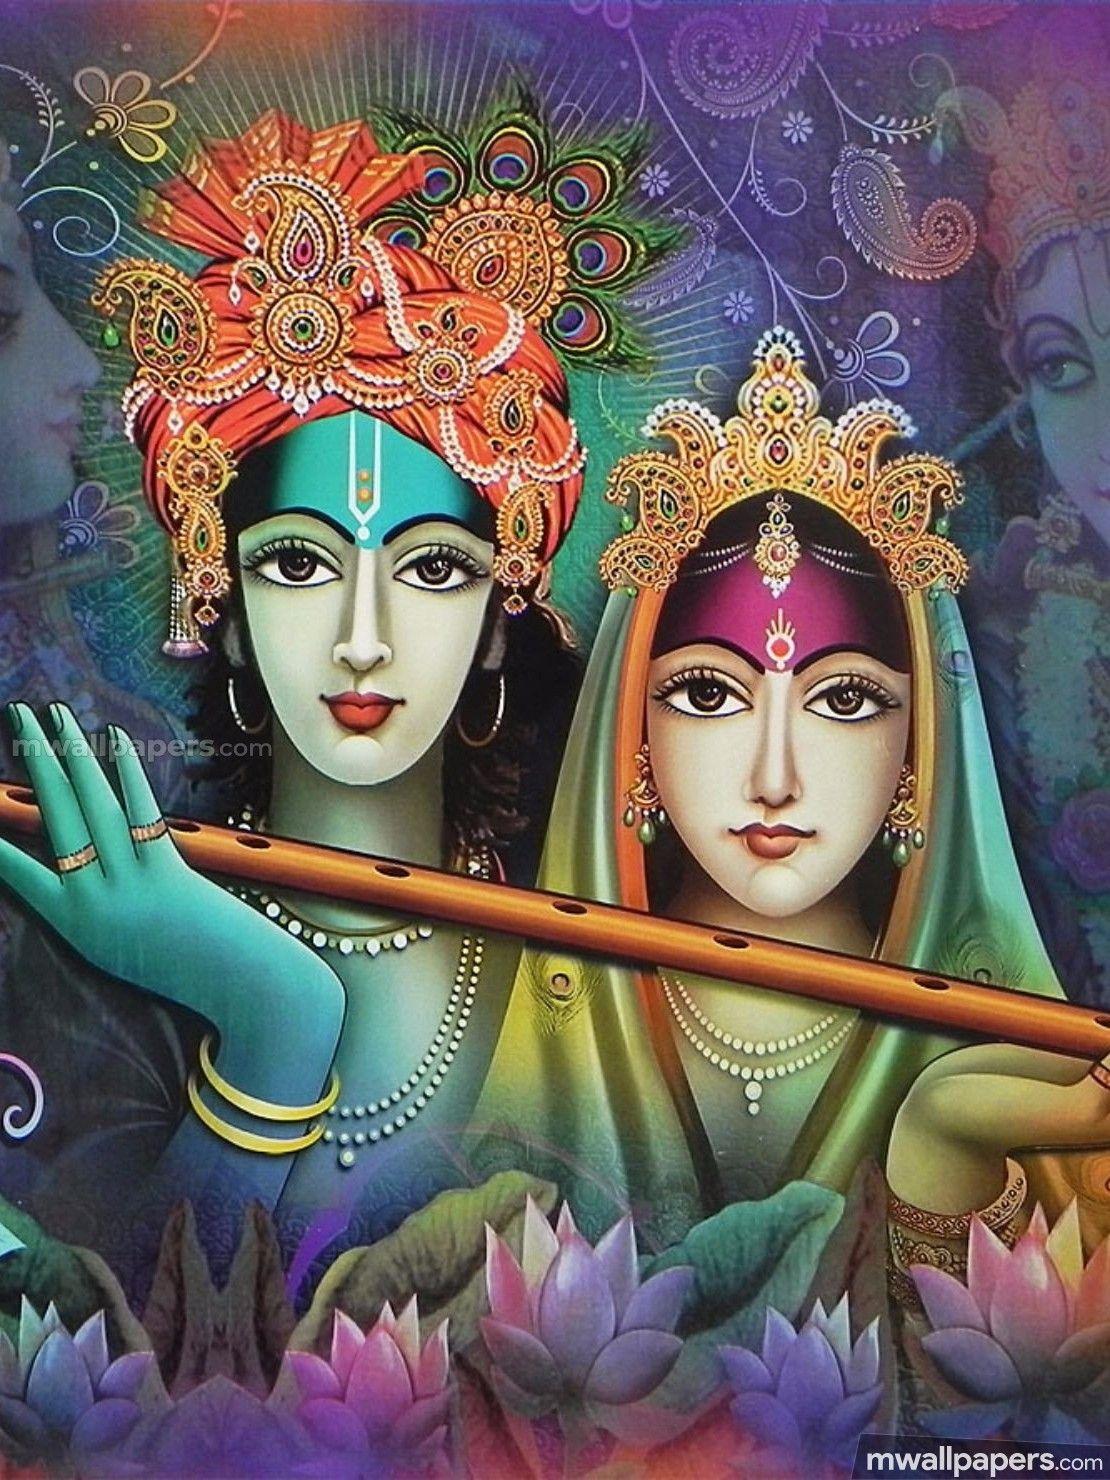 Radha Krishna Hd Photos Wallpapers 1080p Hd Photos Lord Krishna Wallpapers Photo Wallpaper